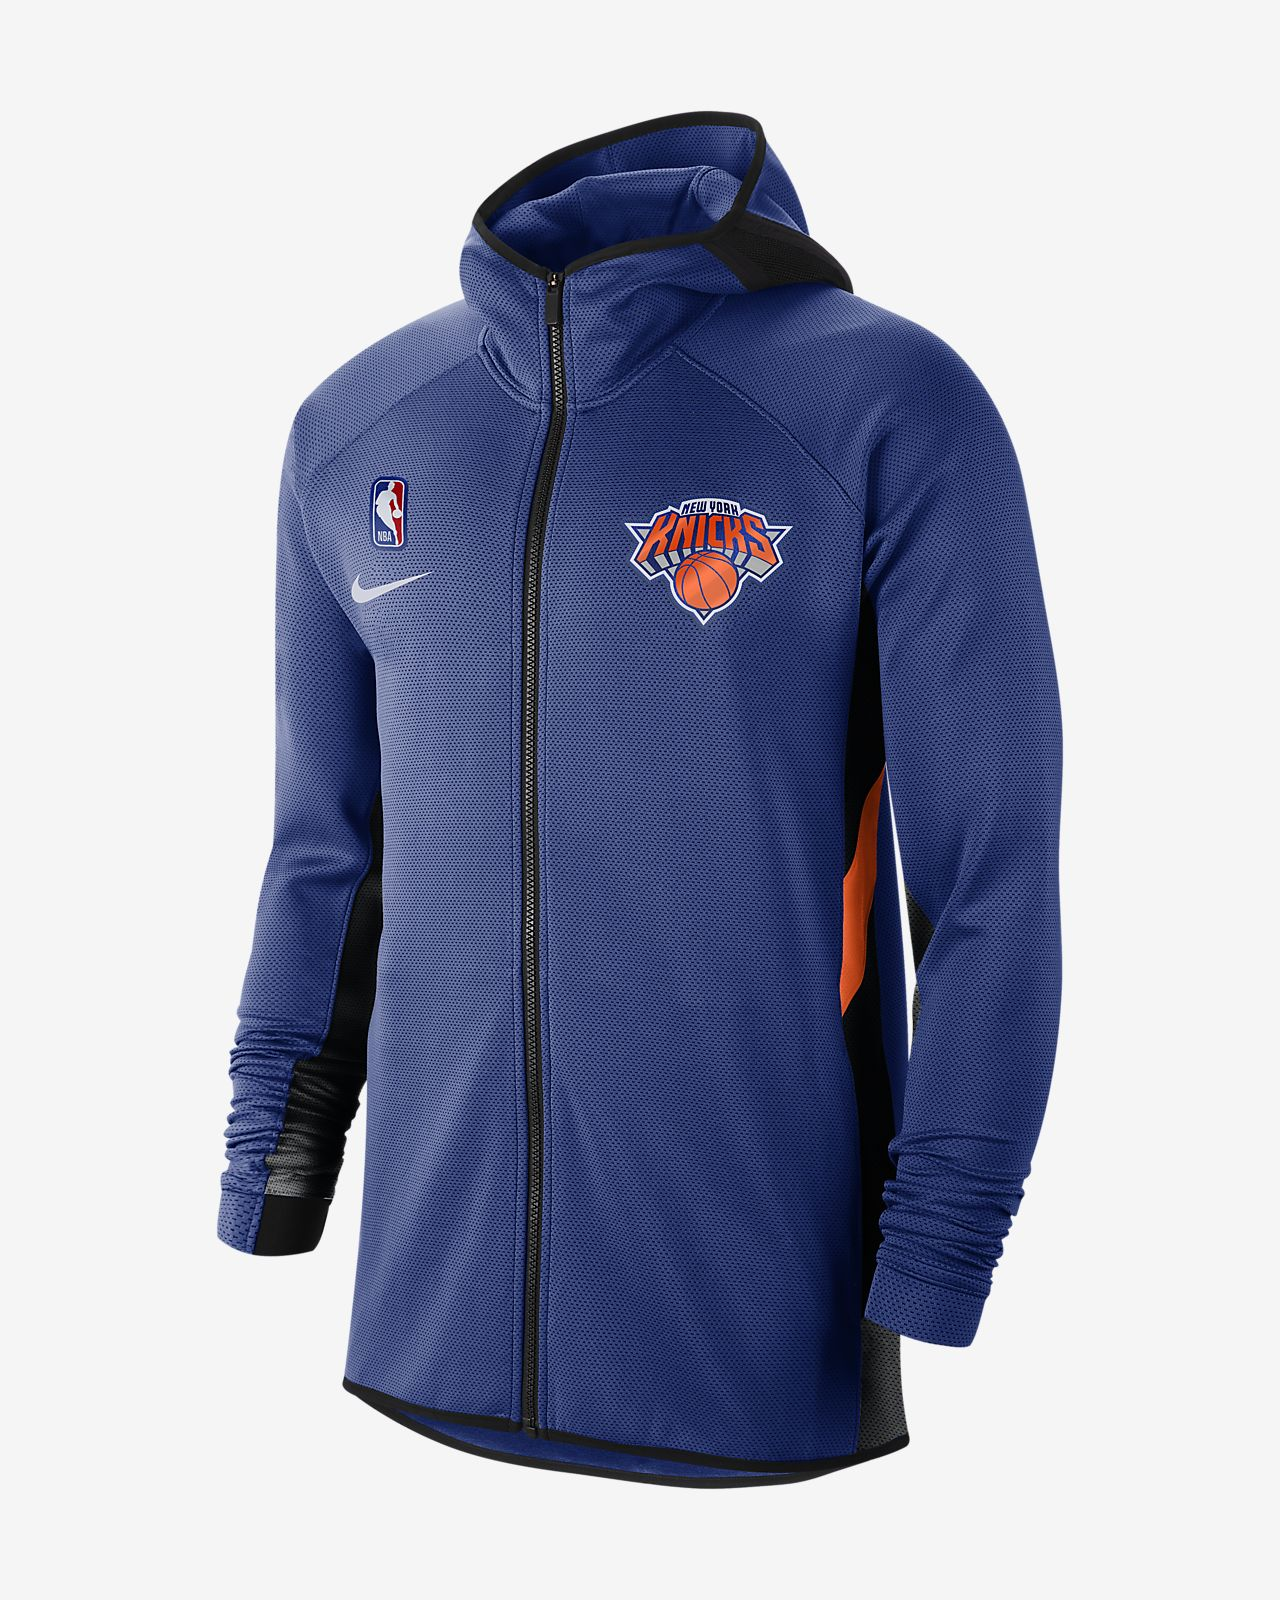 Sudadera con capucha de la NBA para hombre New York Knicks Nike Therma Flex Showtime